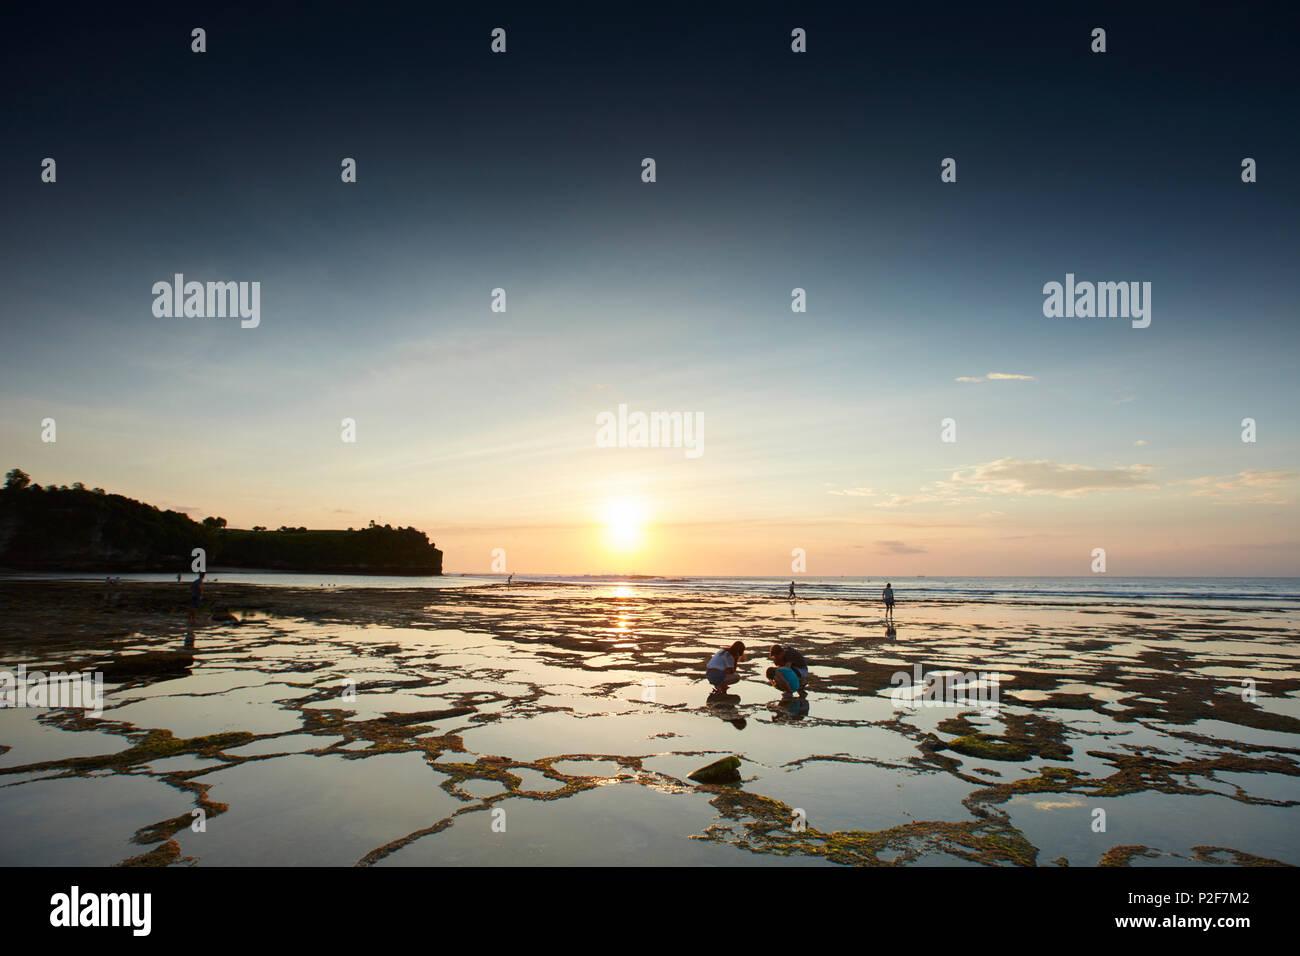 Strand bei Ebbe, Balangan, Bali, Indonesien Stockbild